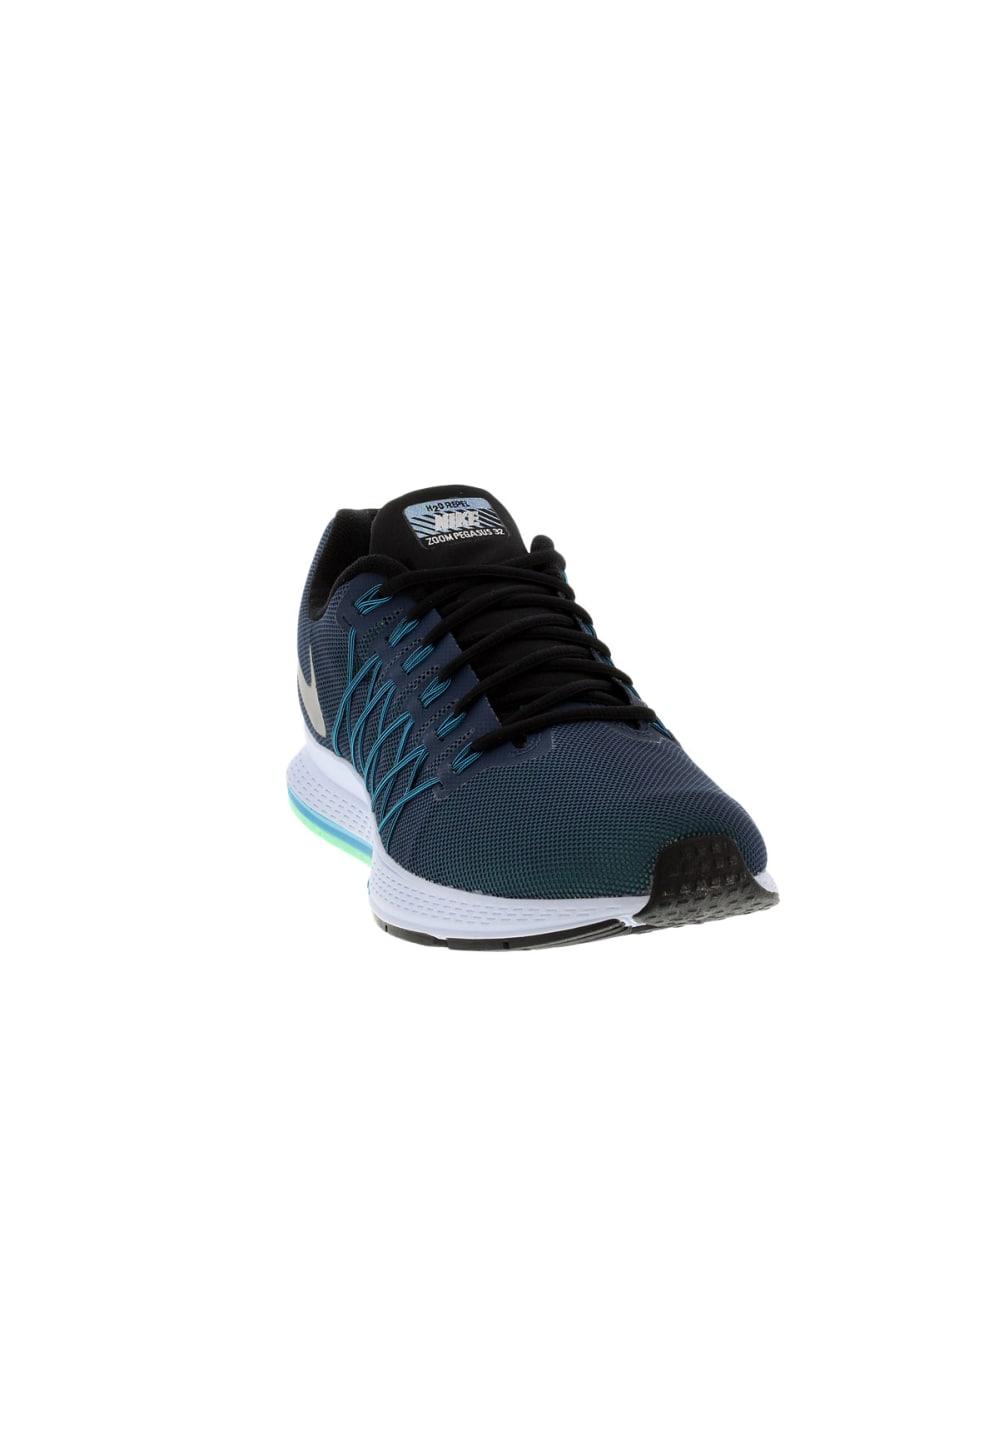 chaussures de sport 73043 1b2b2 Nike Air Zoom Pegasus 32 Flash - Chaussures running pour Homme - Noir